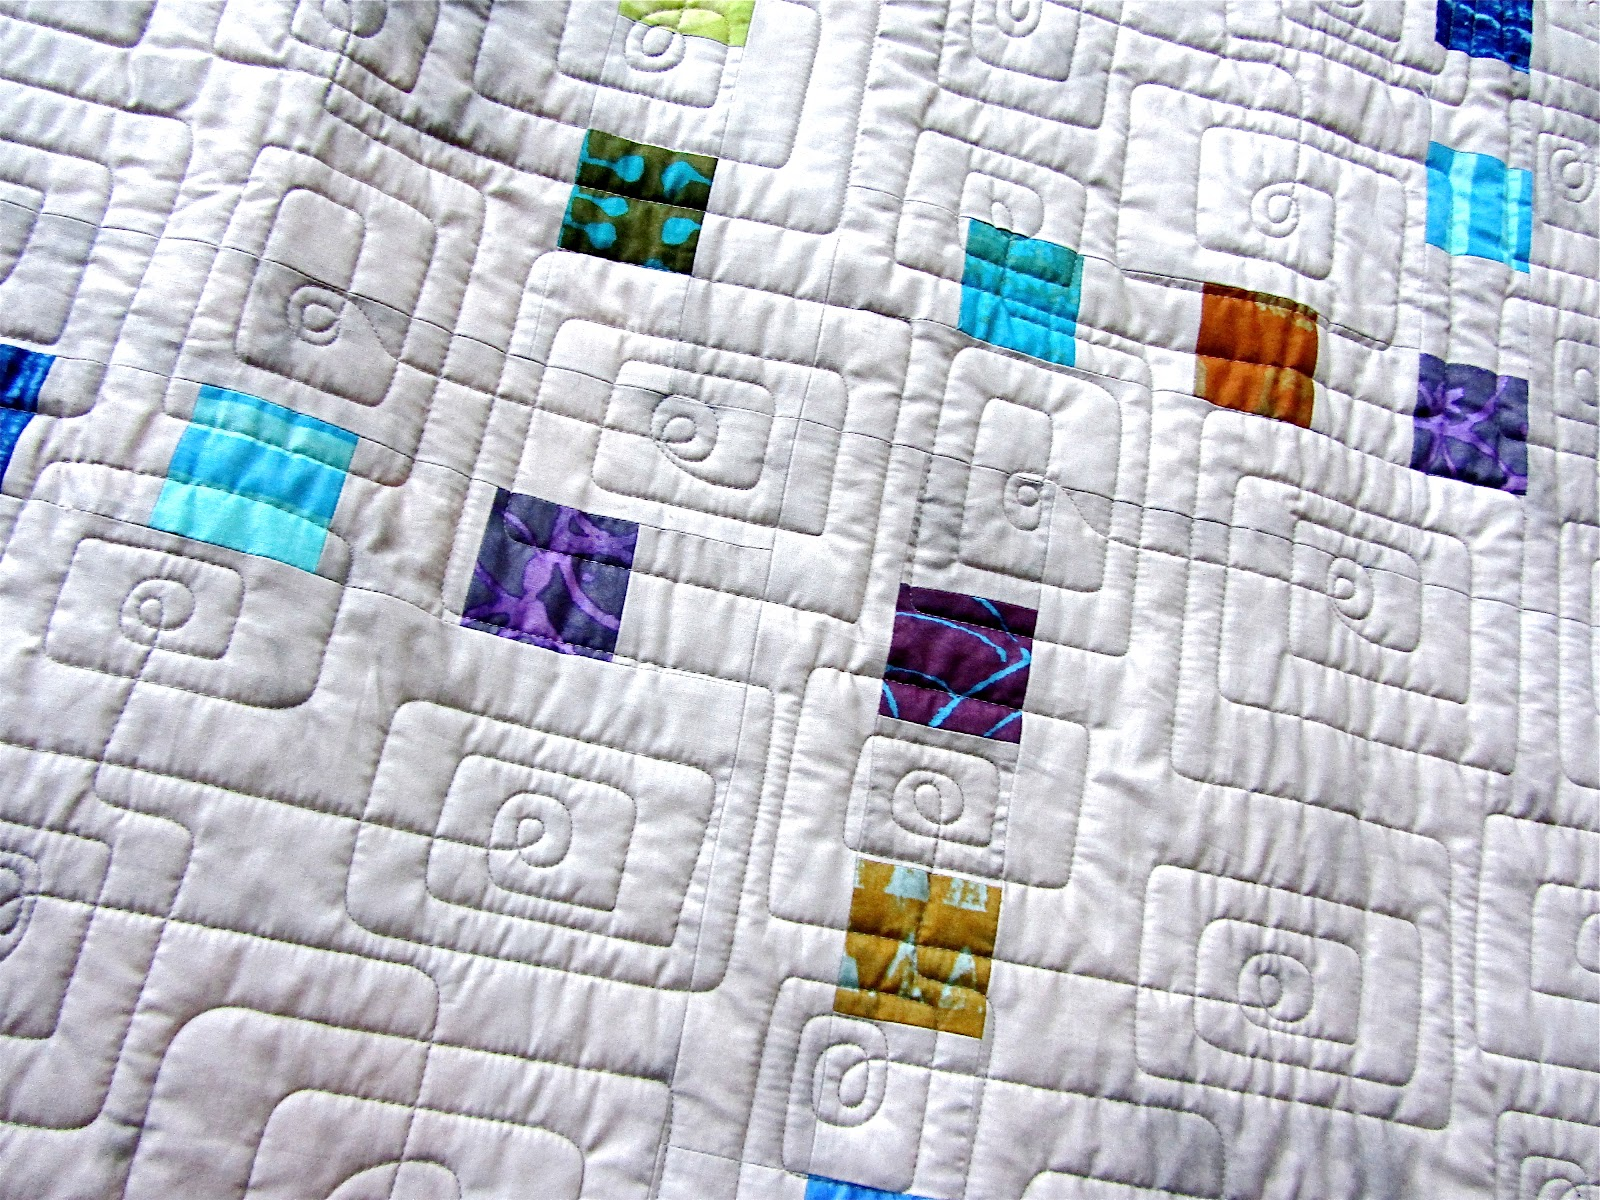 Modern Quilt Relish Nibbles Nouveau Modern Quilt In